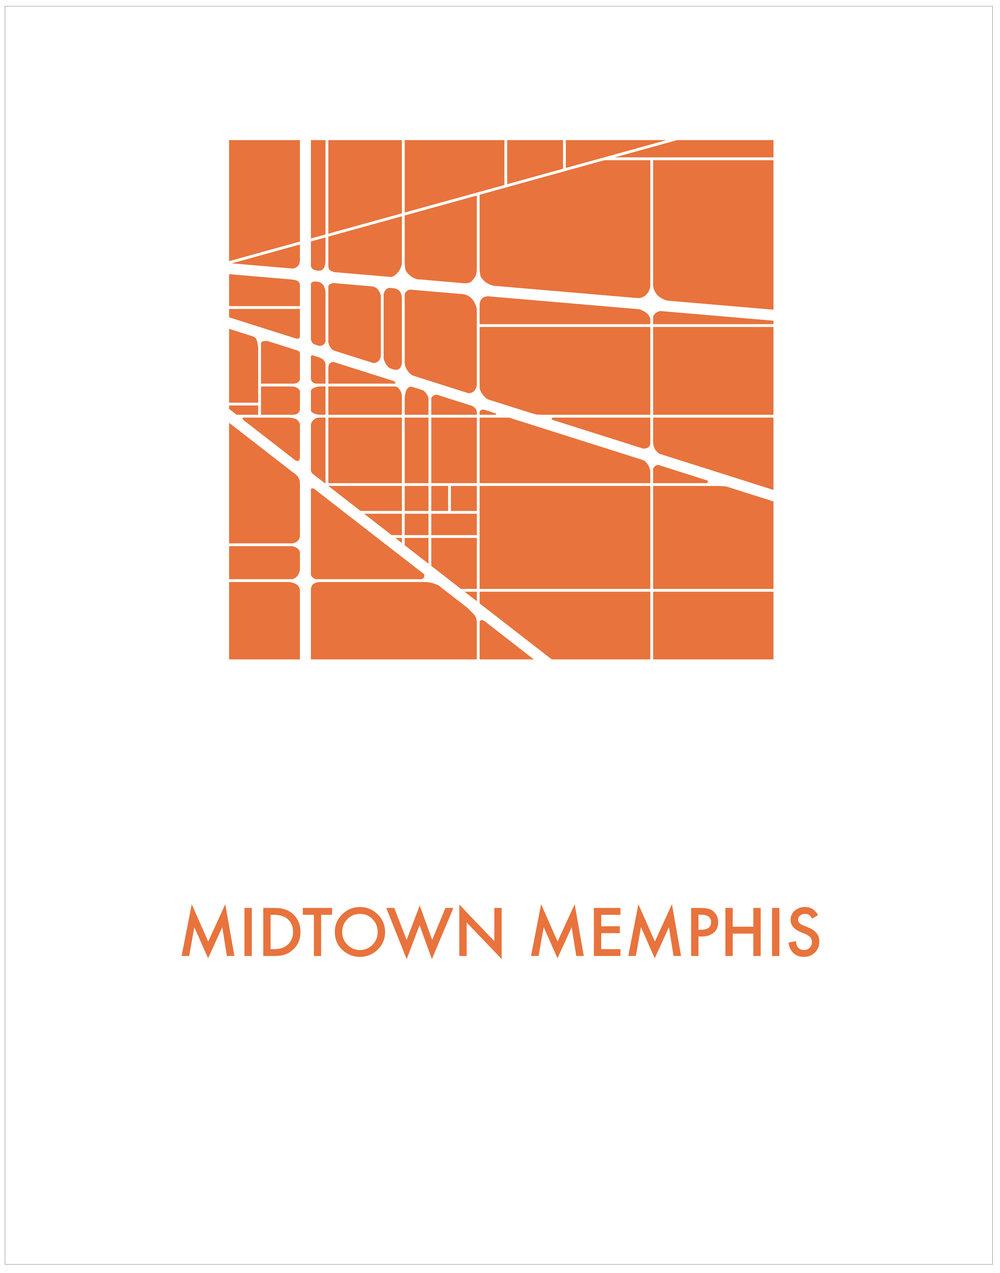 midtown memphis2.jpg